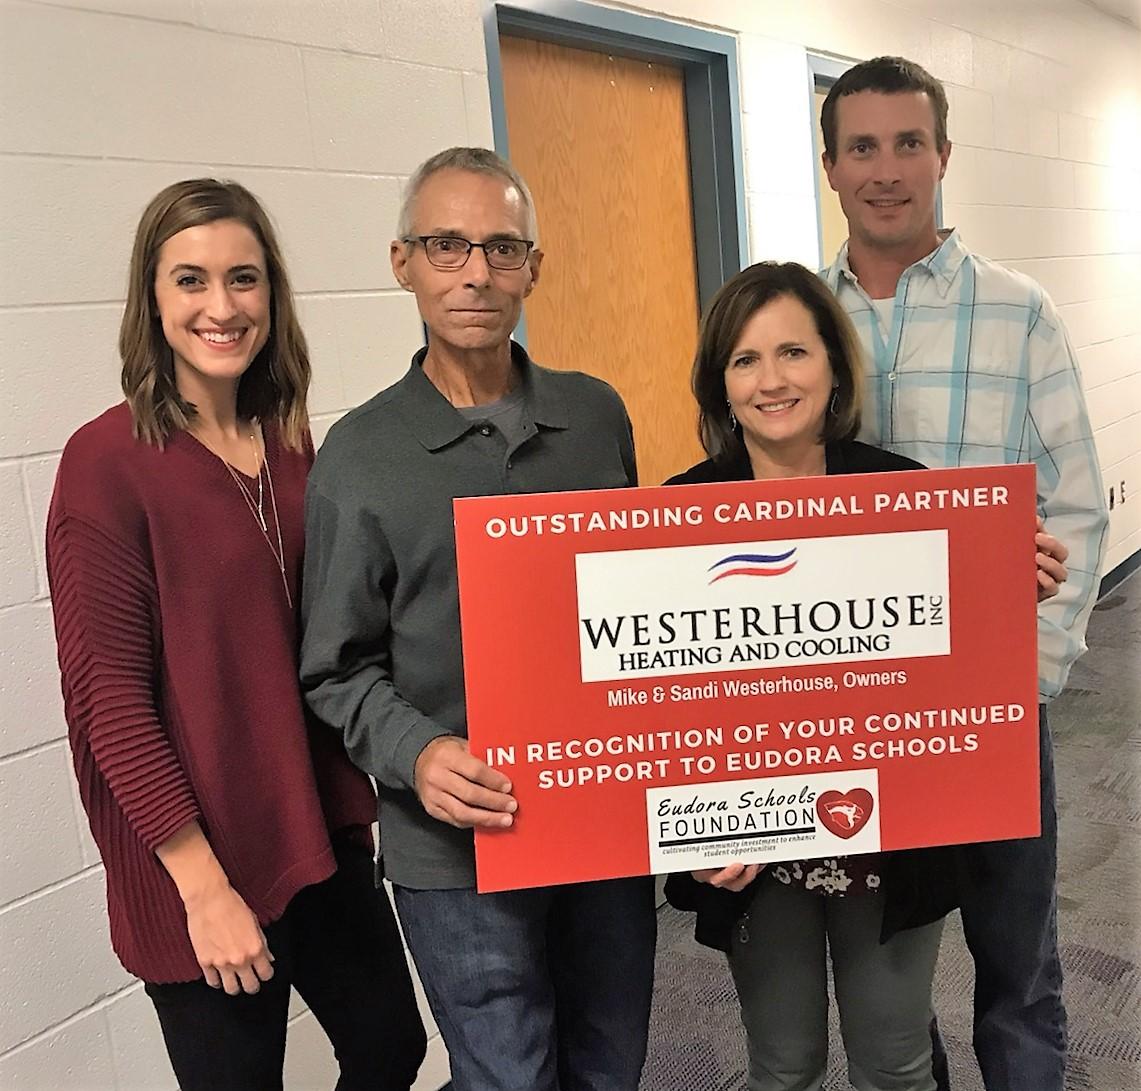 Congratulations to Westerhouse Heating & Cooling. -  2019 Eudora Schools Foundation Outstanding Cardinal Partner.